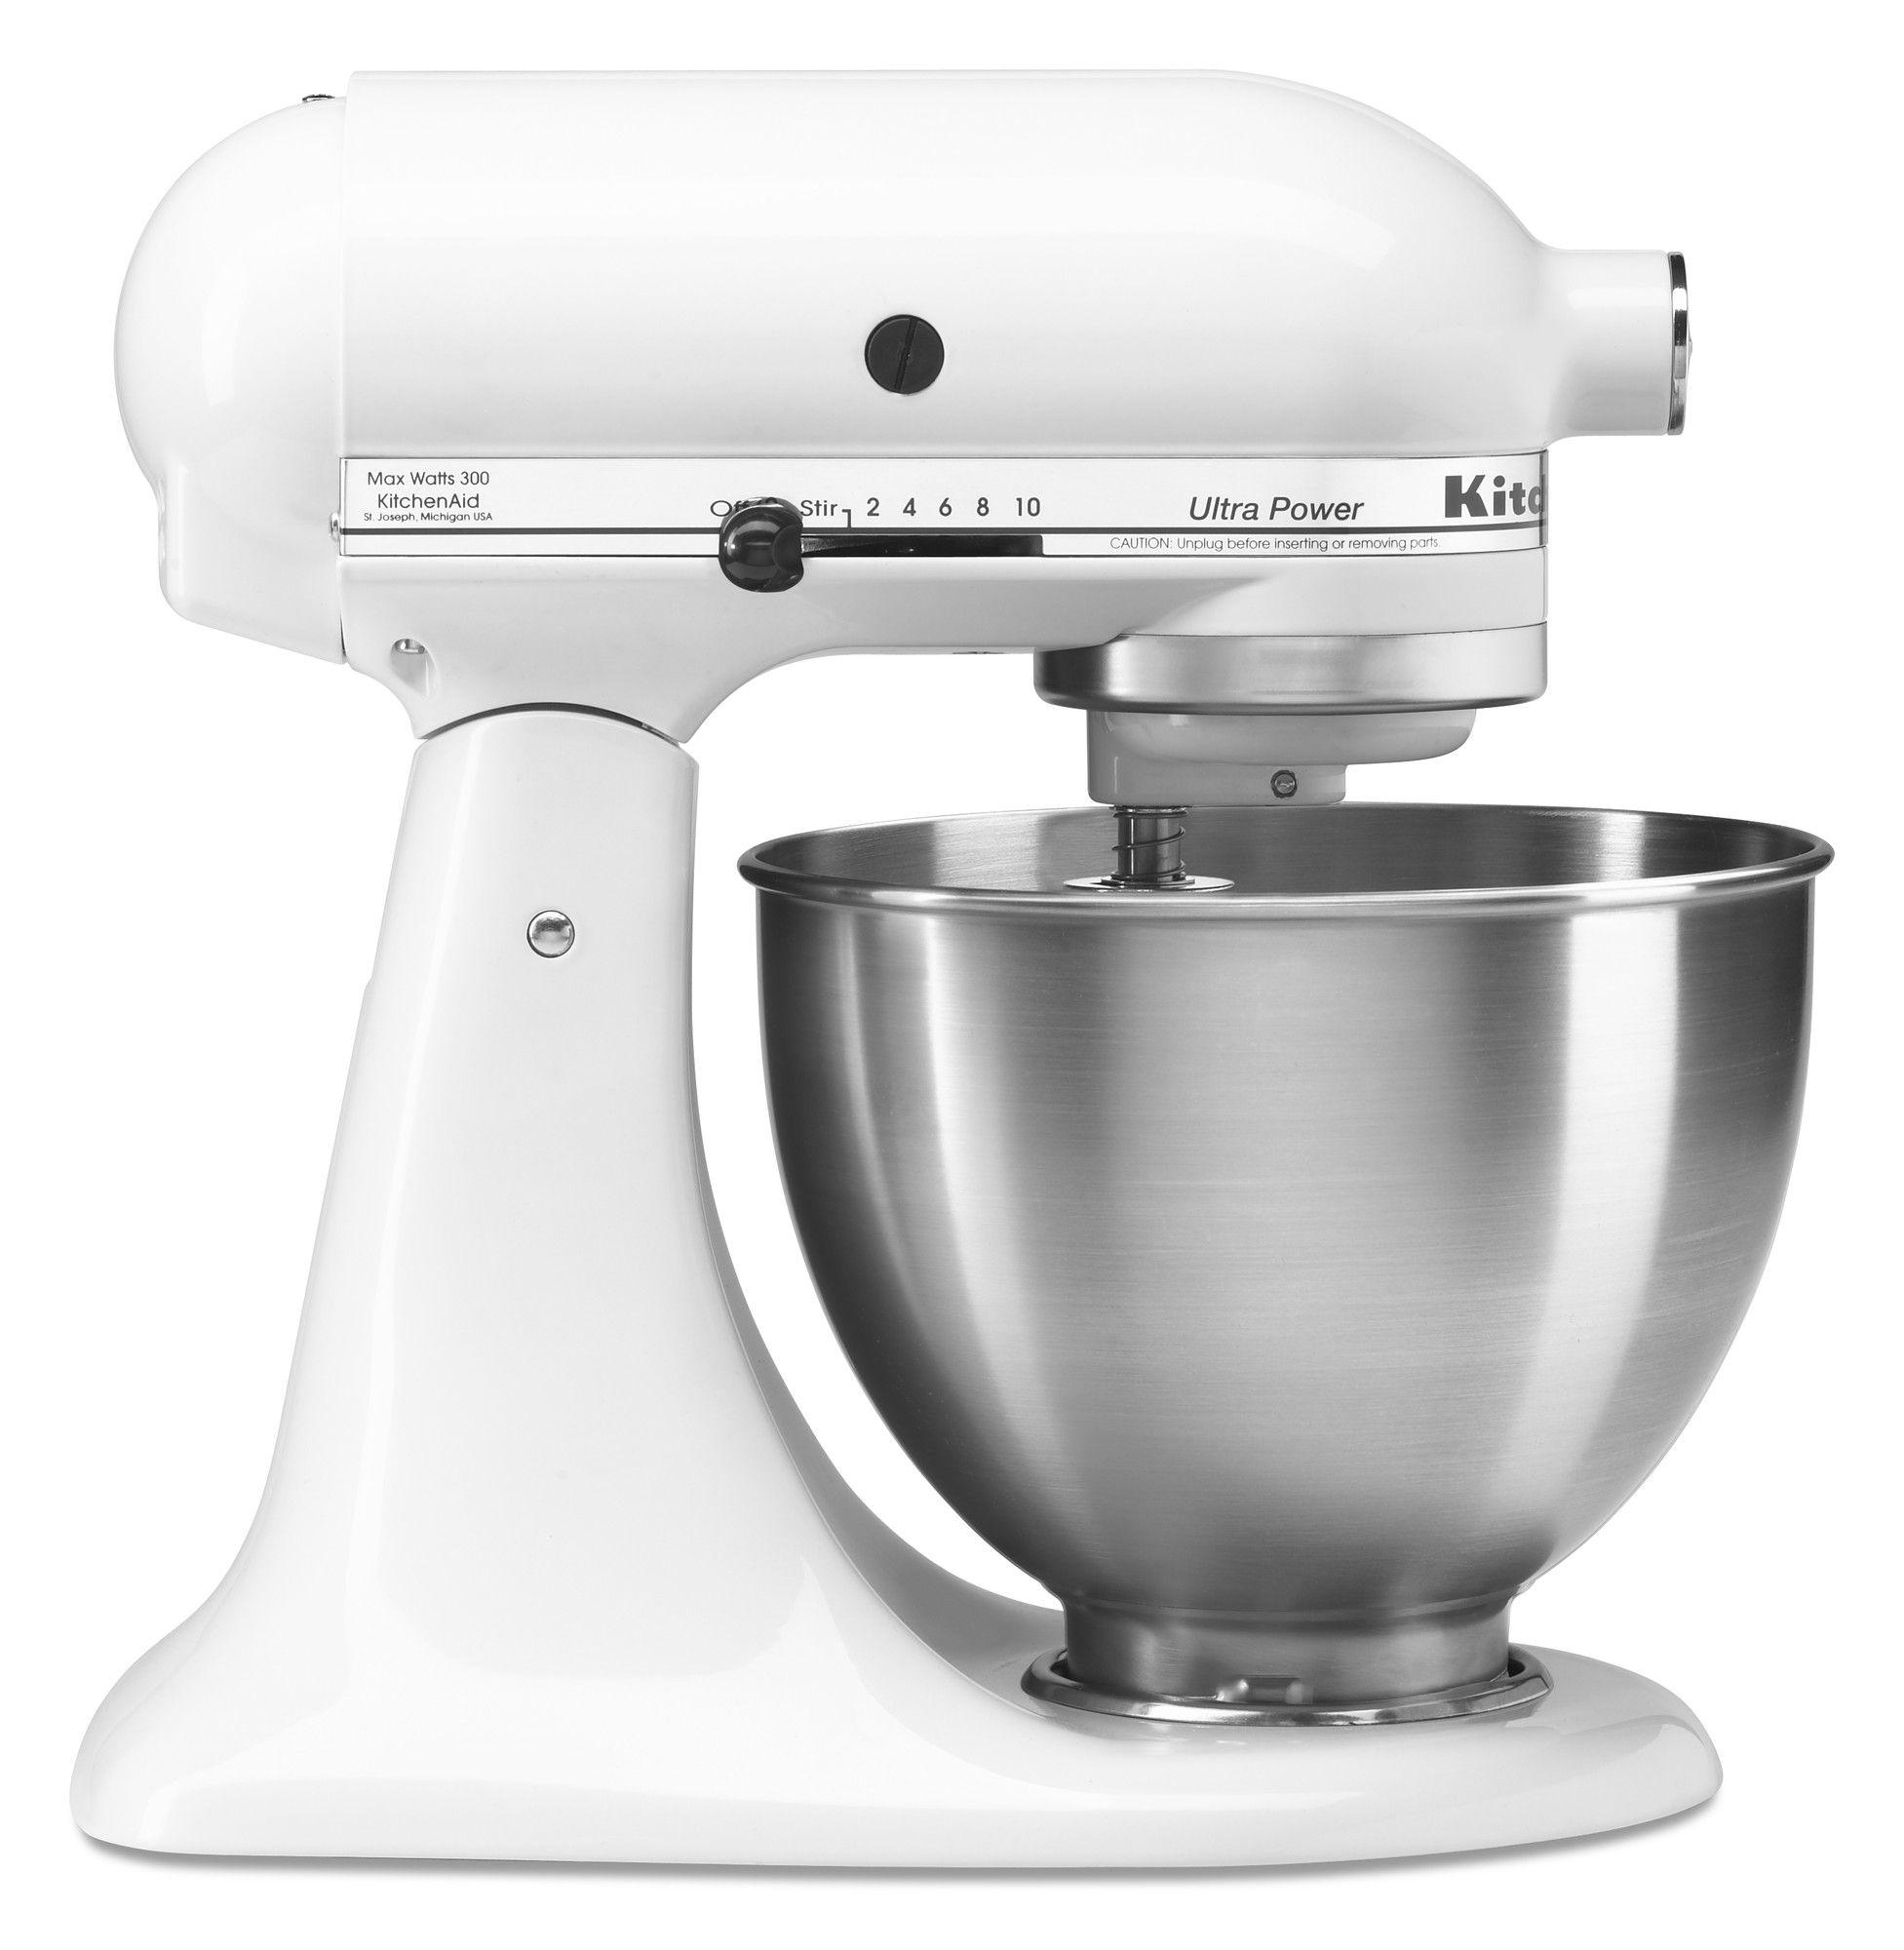 Ultra Power Series 4 5 Qt Stand Mixer Kitchen Aid Mixer